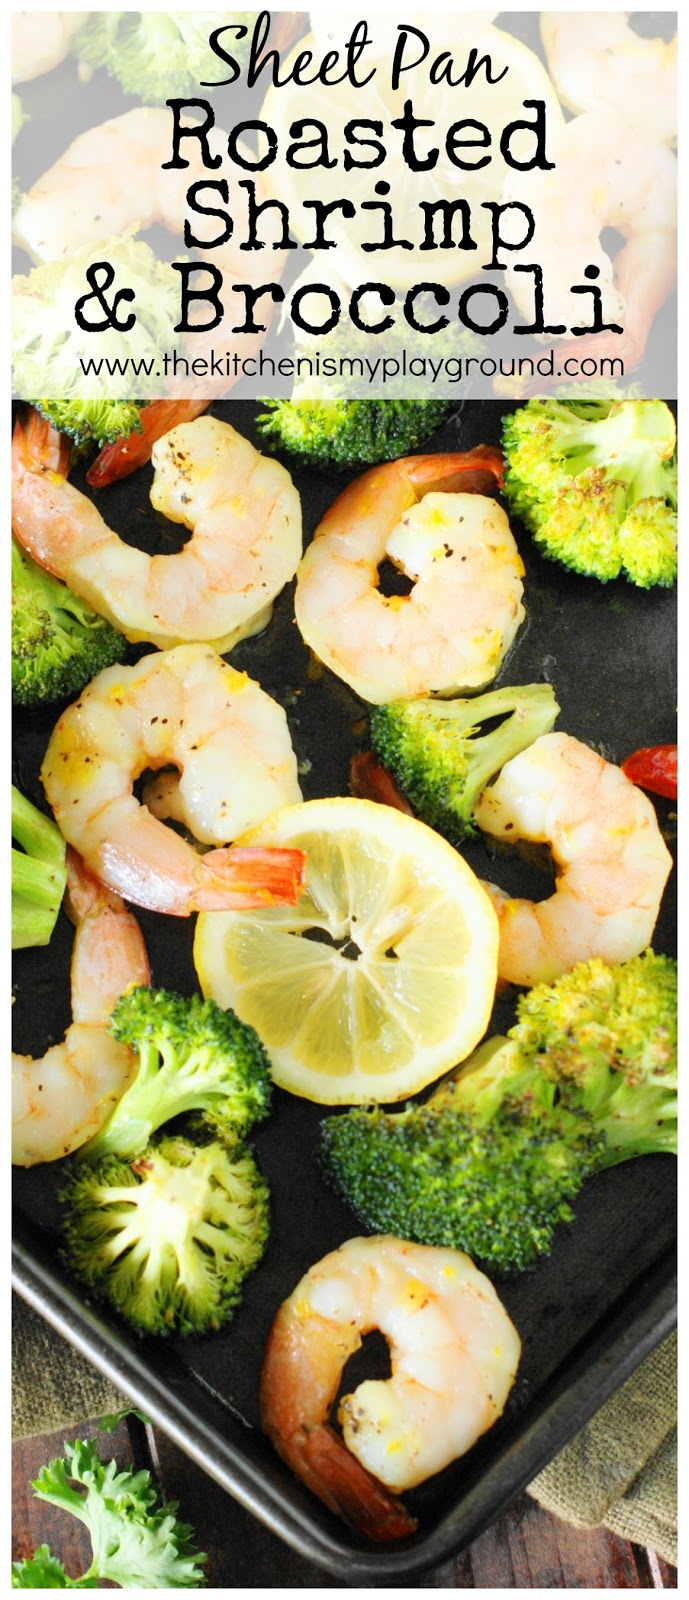 Roasted Shrimp Broccoli Sheet Pan Supper